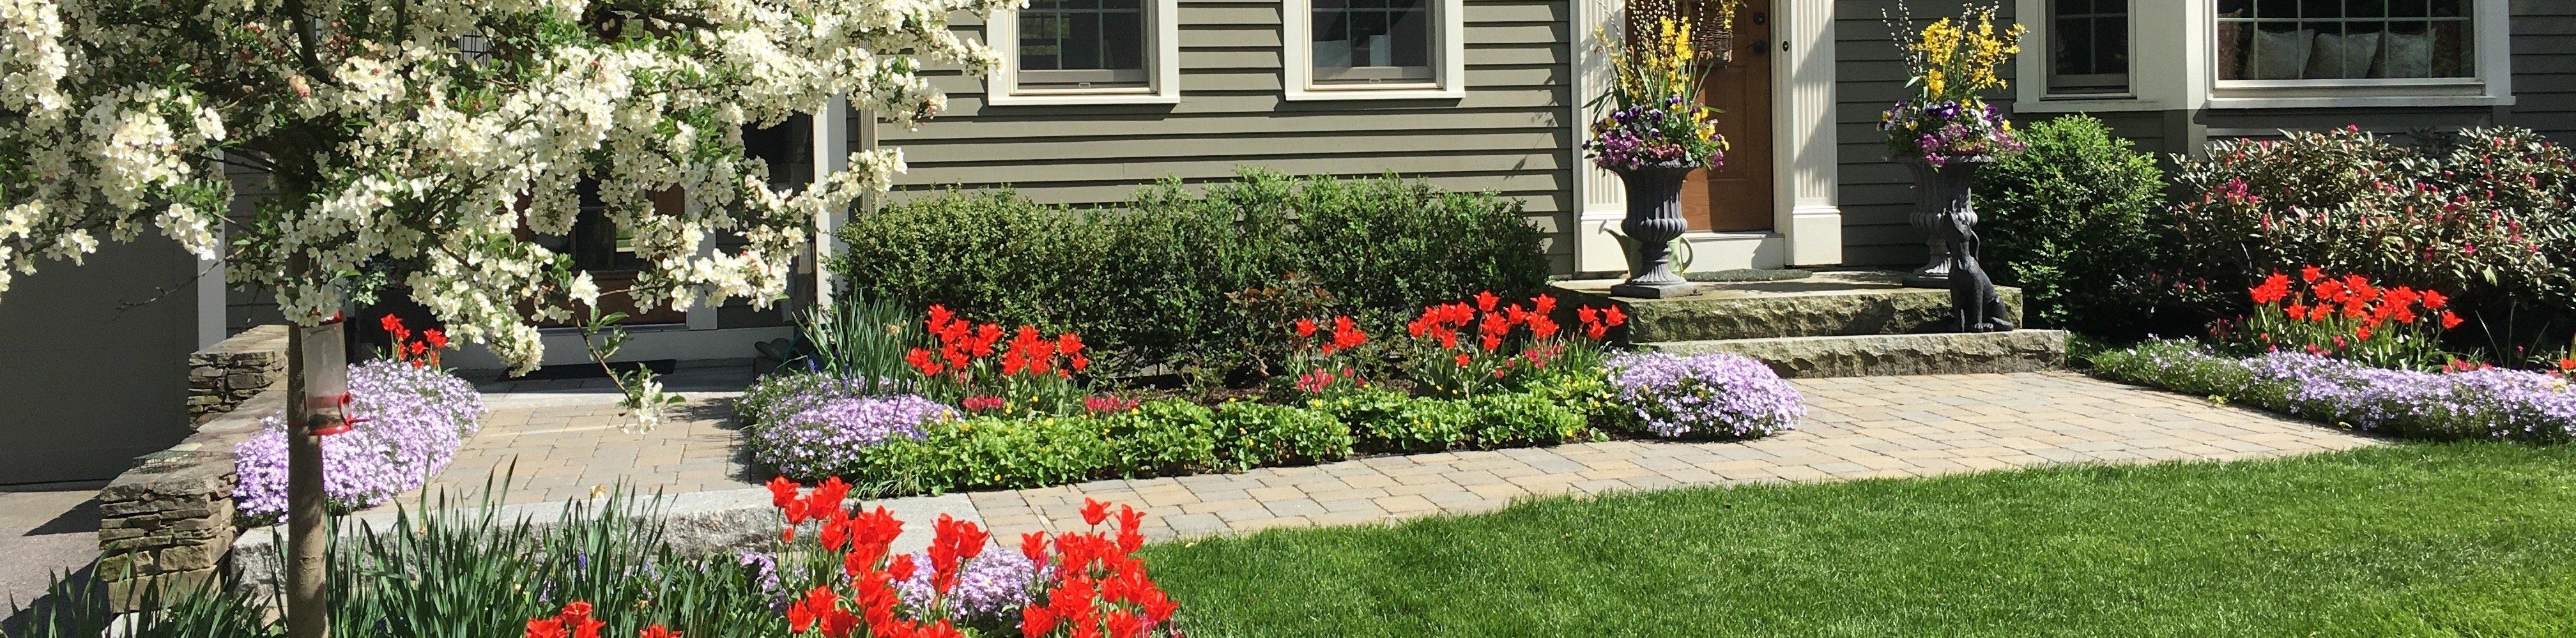 05-13-17 Spring Blooms - Tulips - Mykulak (5)-1